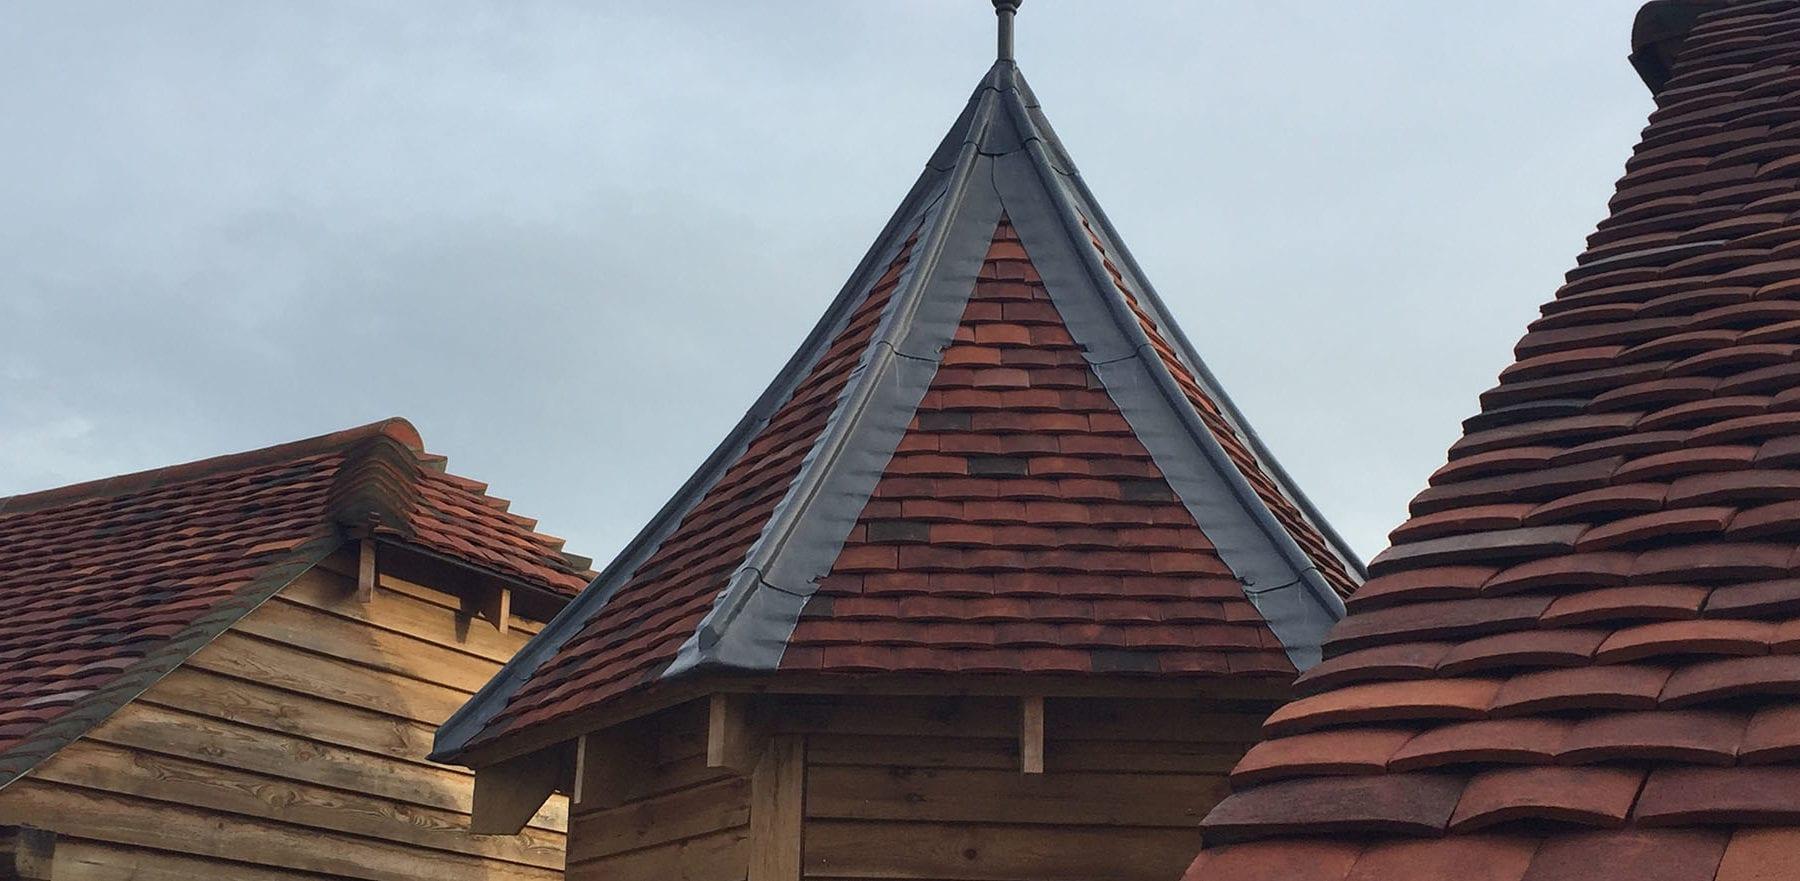 Lifestiles - Handmade Multi Clay Roof Tiles - Tenterden, England 5